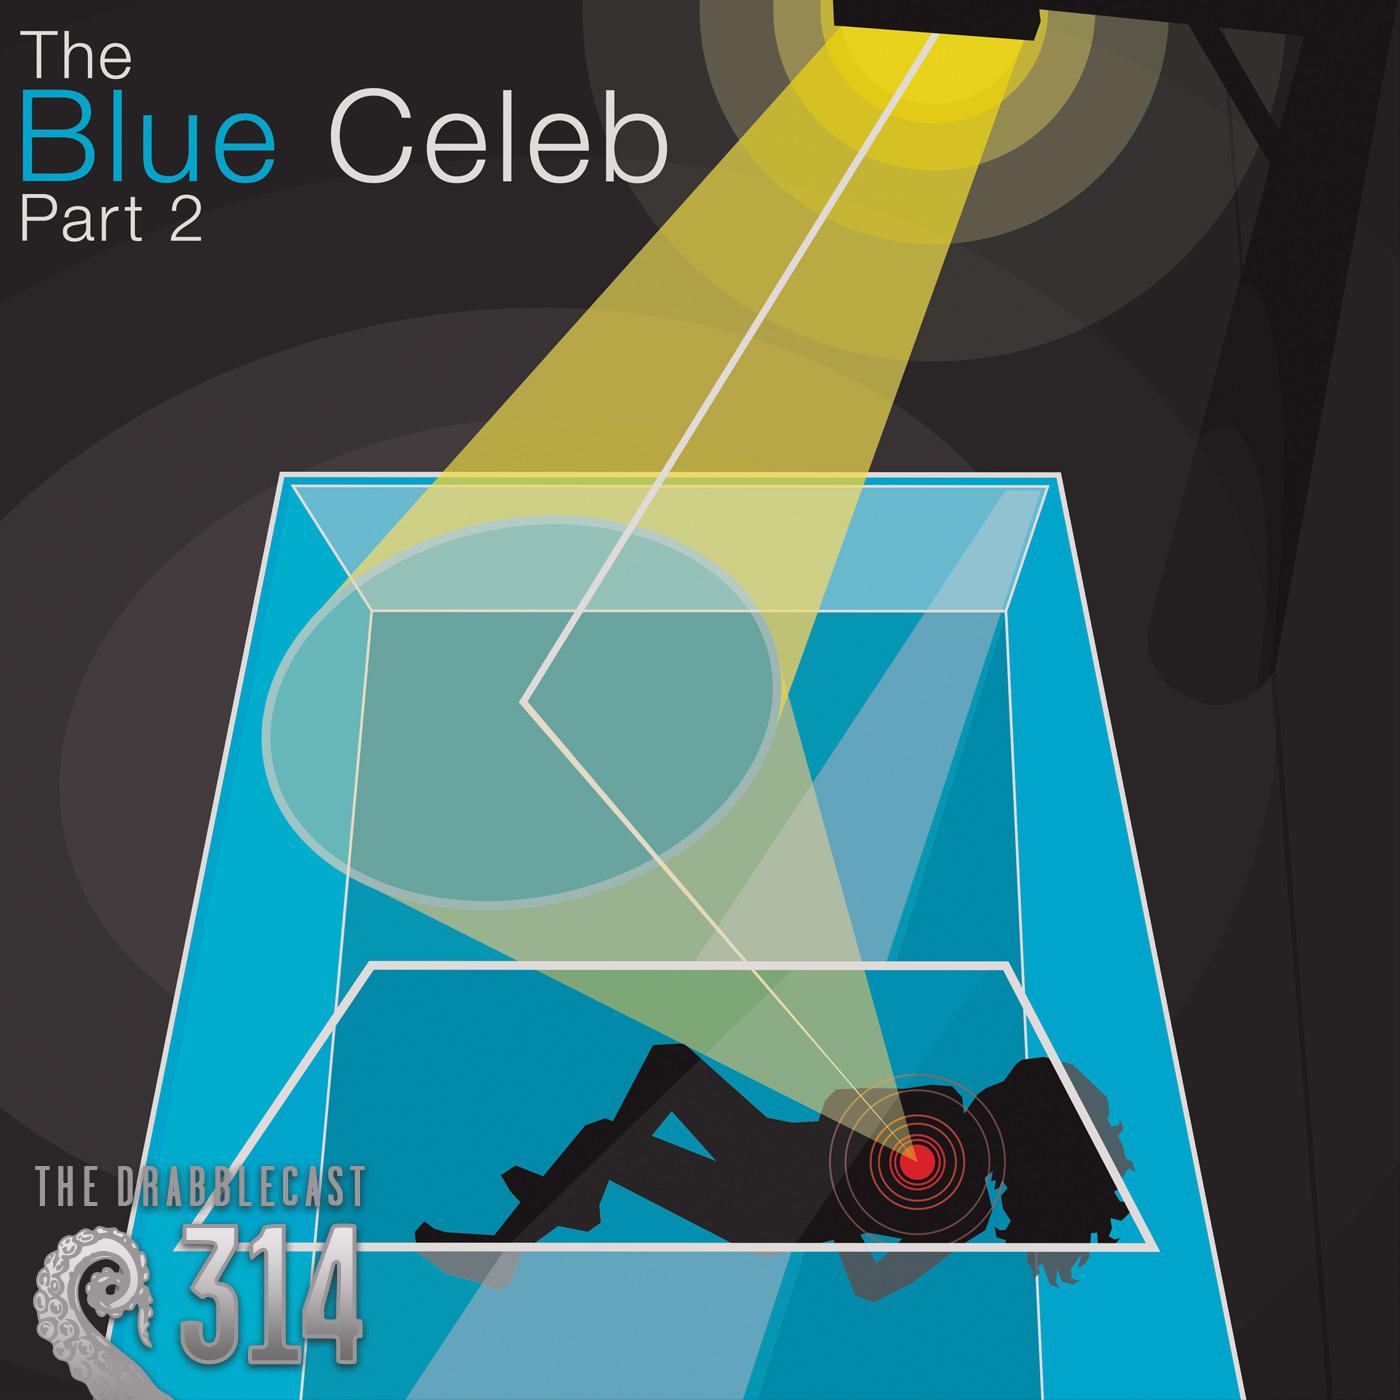 Cover for Drabblecast 314, The Blue Celeb part 2, by Matt Waisela